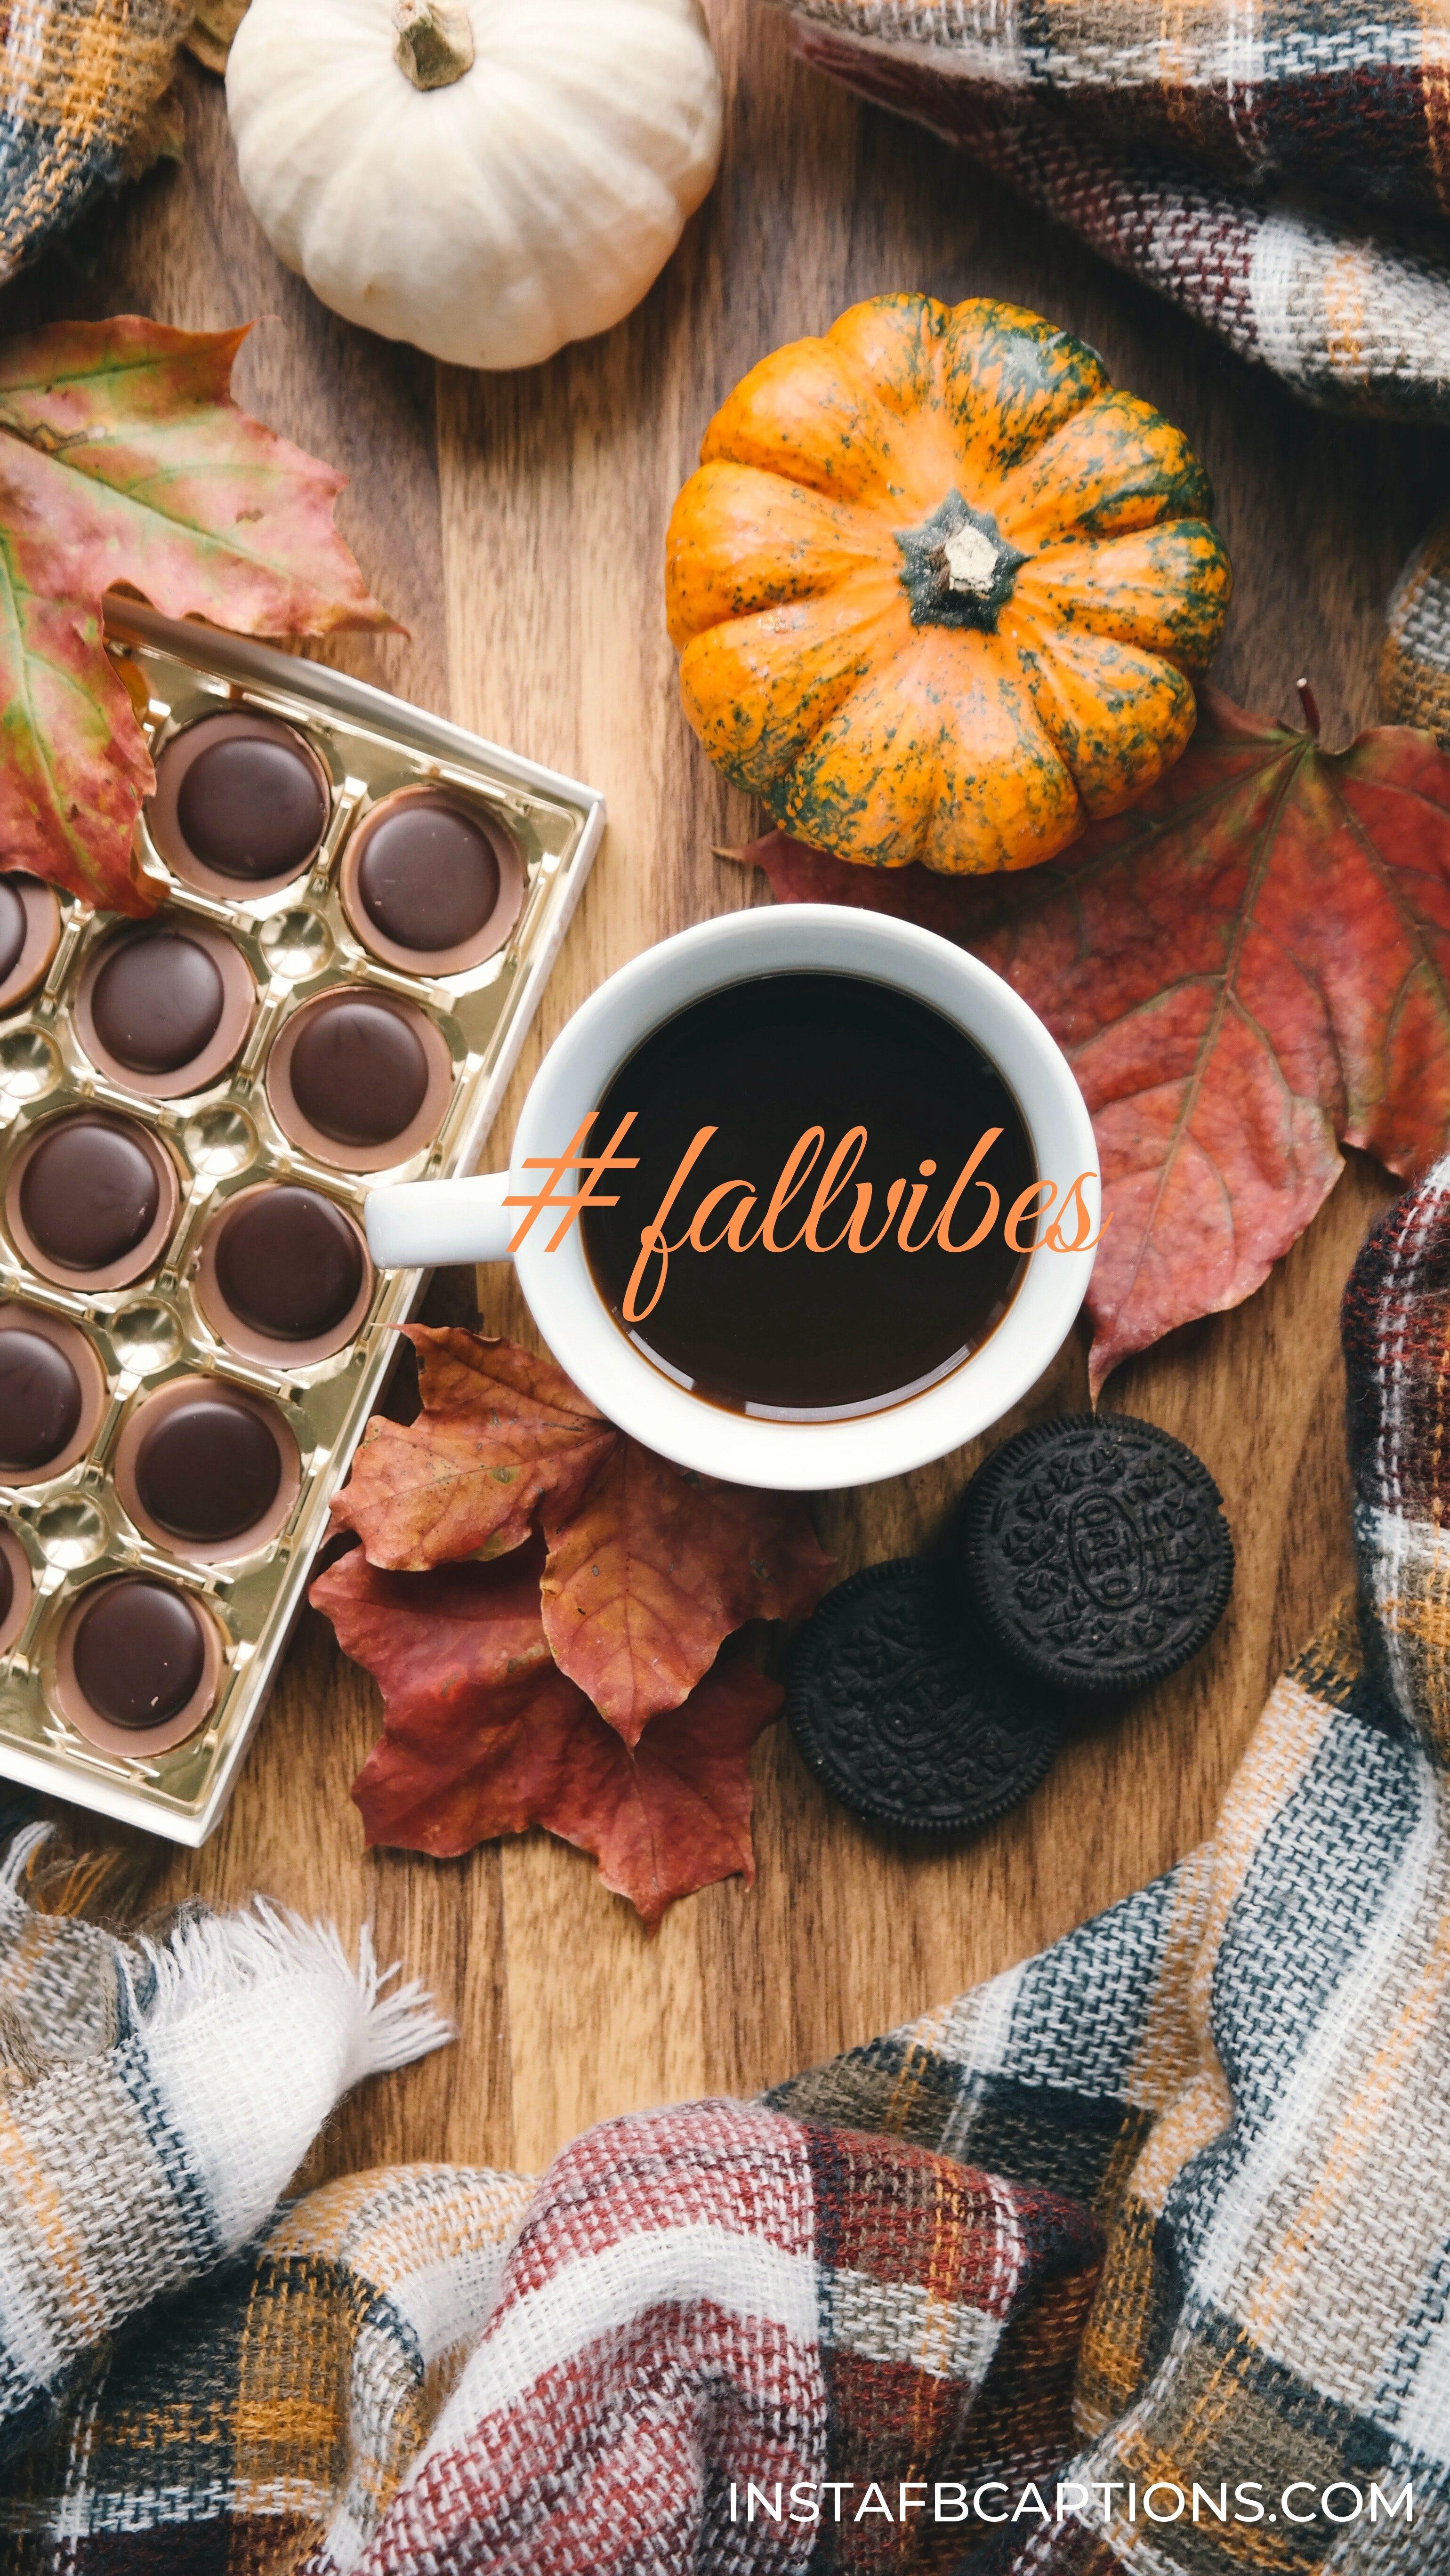 Hashtags For Autum  - Hashtags for Autumn - 120+ FALL Instagram Captions for AUTUMN 2021